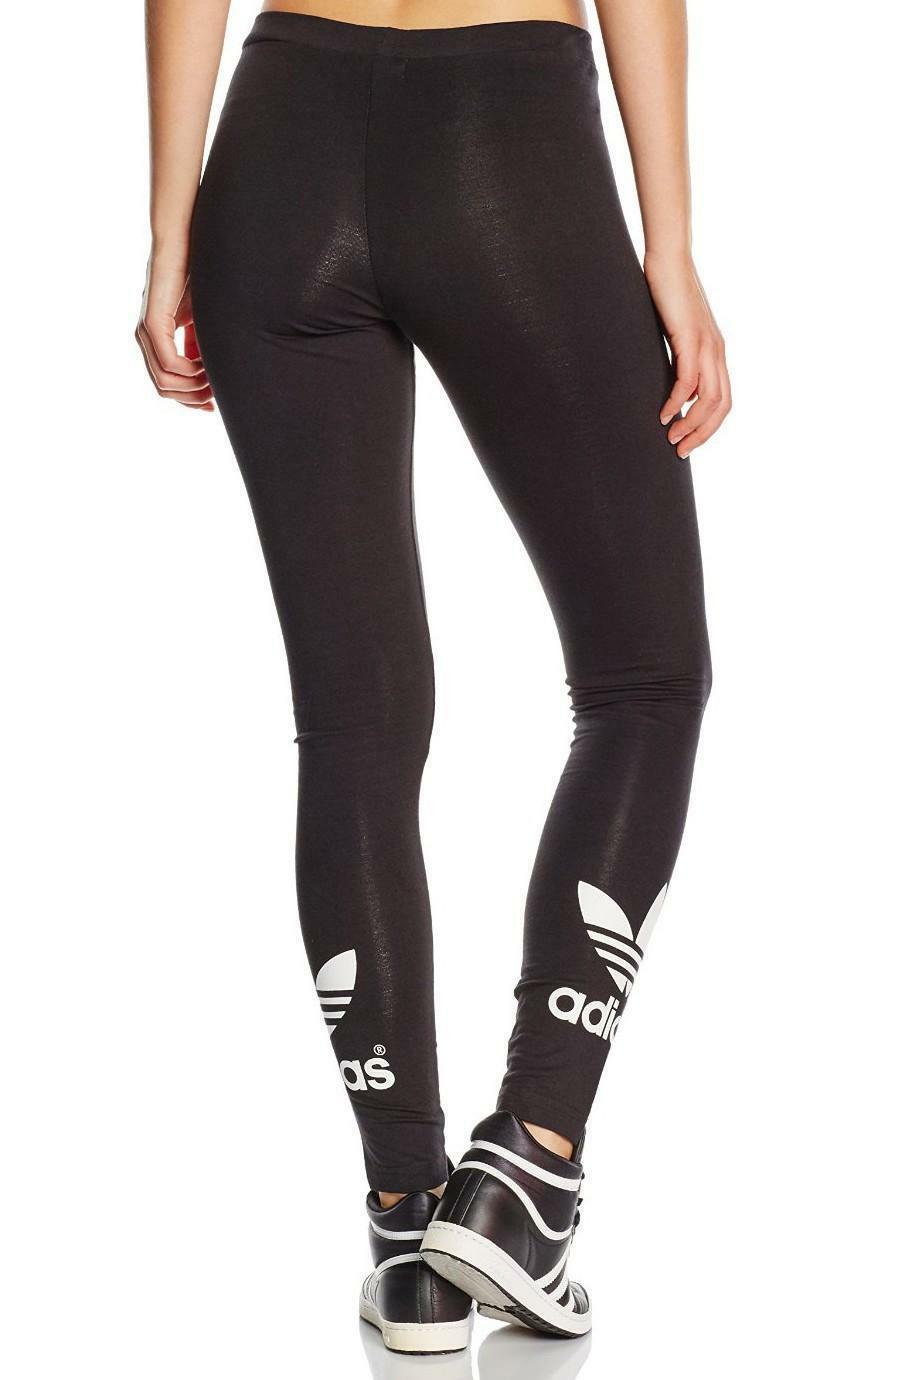 Adidas trf leggings donna cotone elasticizzati neri